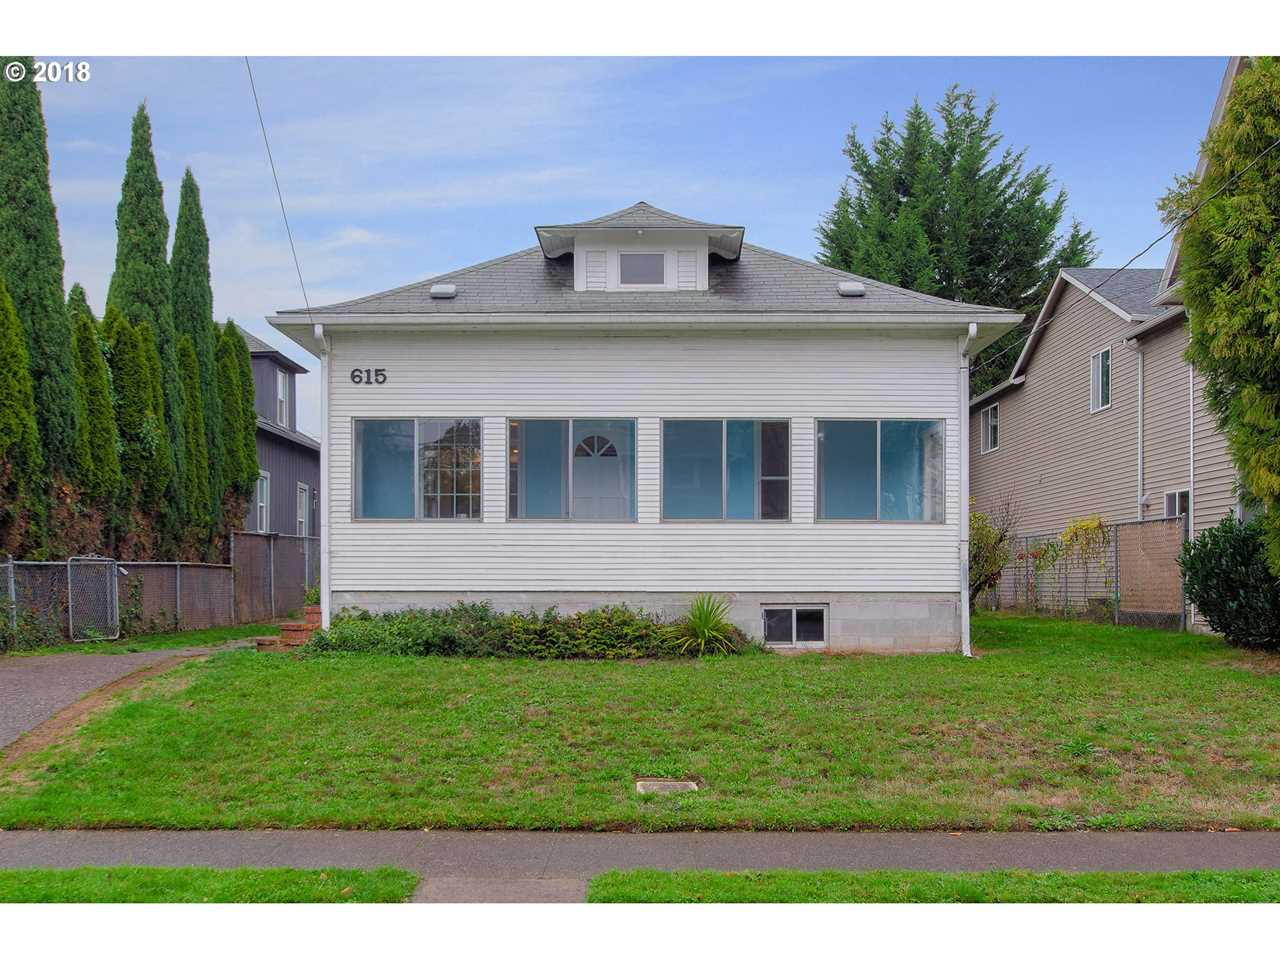 Camas Wa Home For Sale 615 E 1st Ave Camas Wa Mls